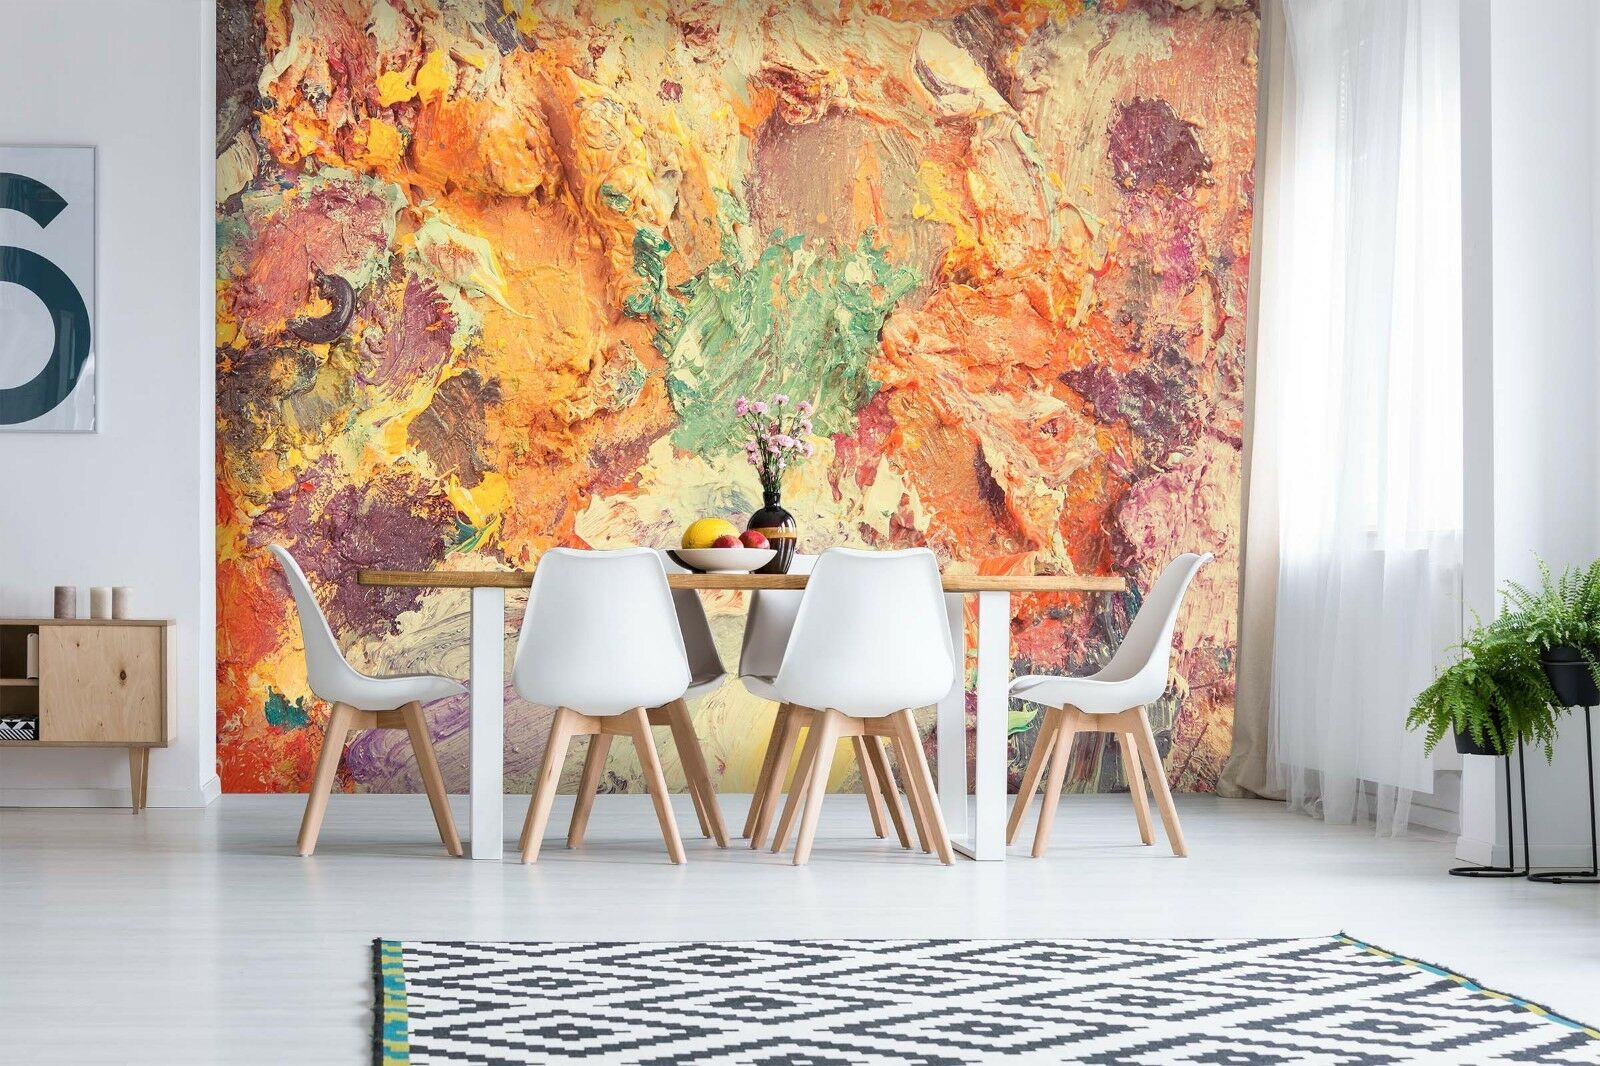 3D Farbeed Paint Graffiti 4 Wallpaper Murals Wall Print Wallpaper Mural AJ WALL